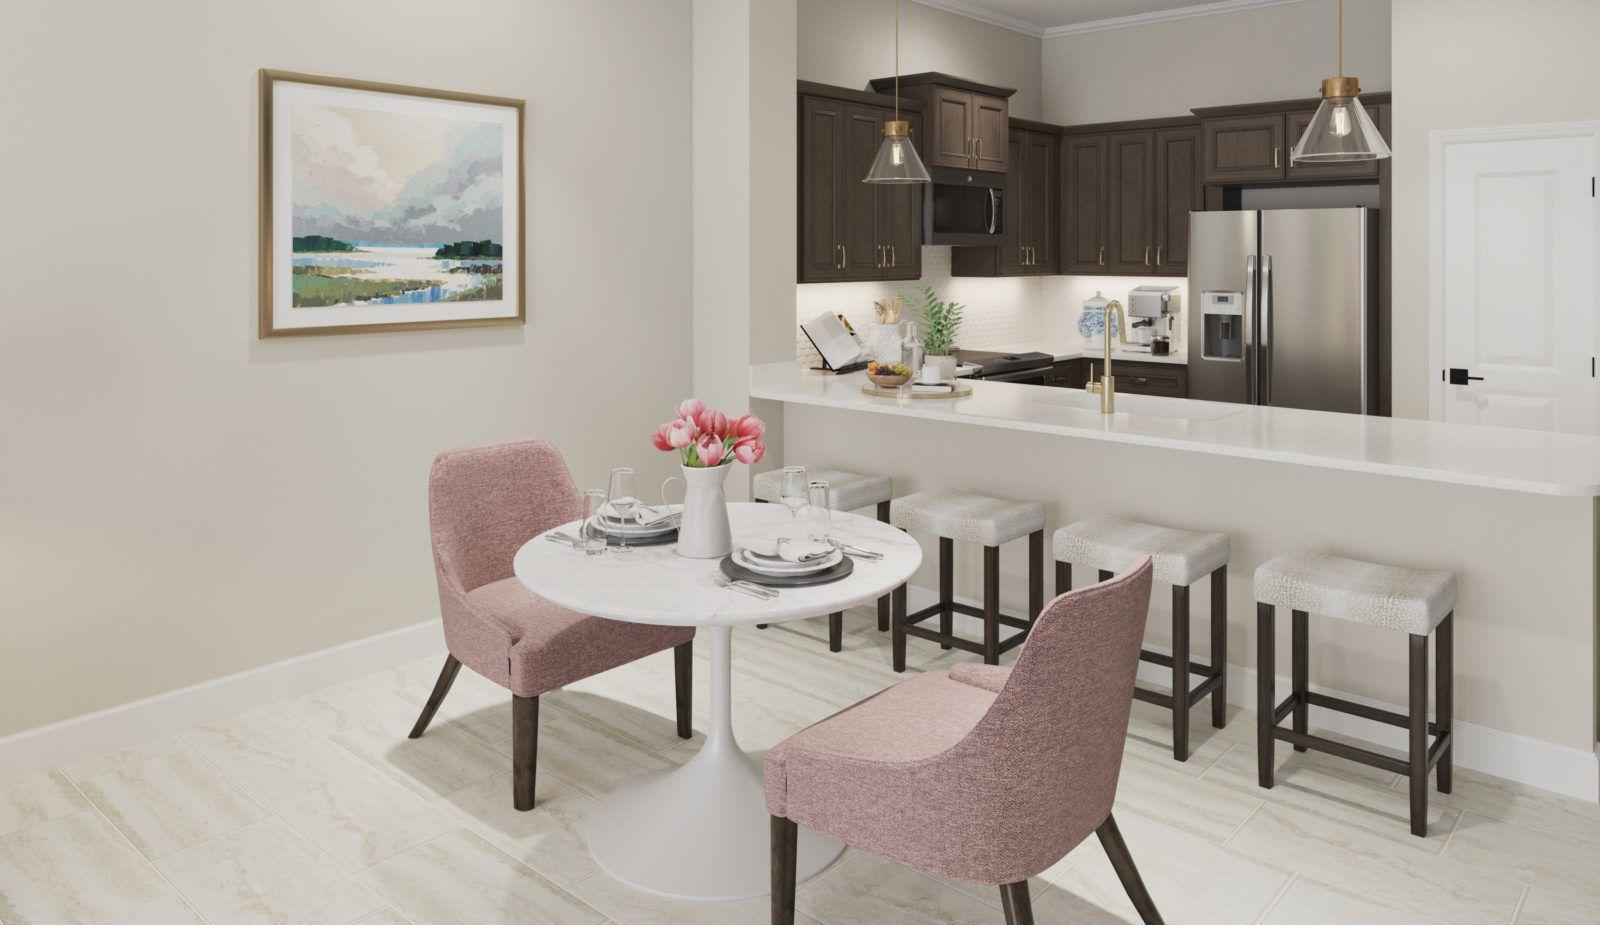 Kitchen featured in the Augusta By Neal Communities in Punta Gorda, FL